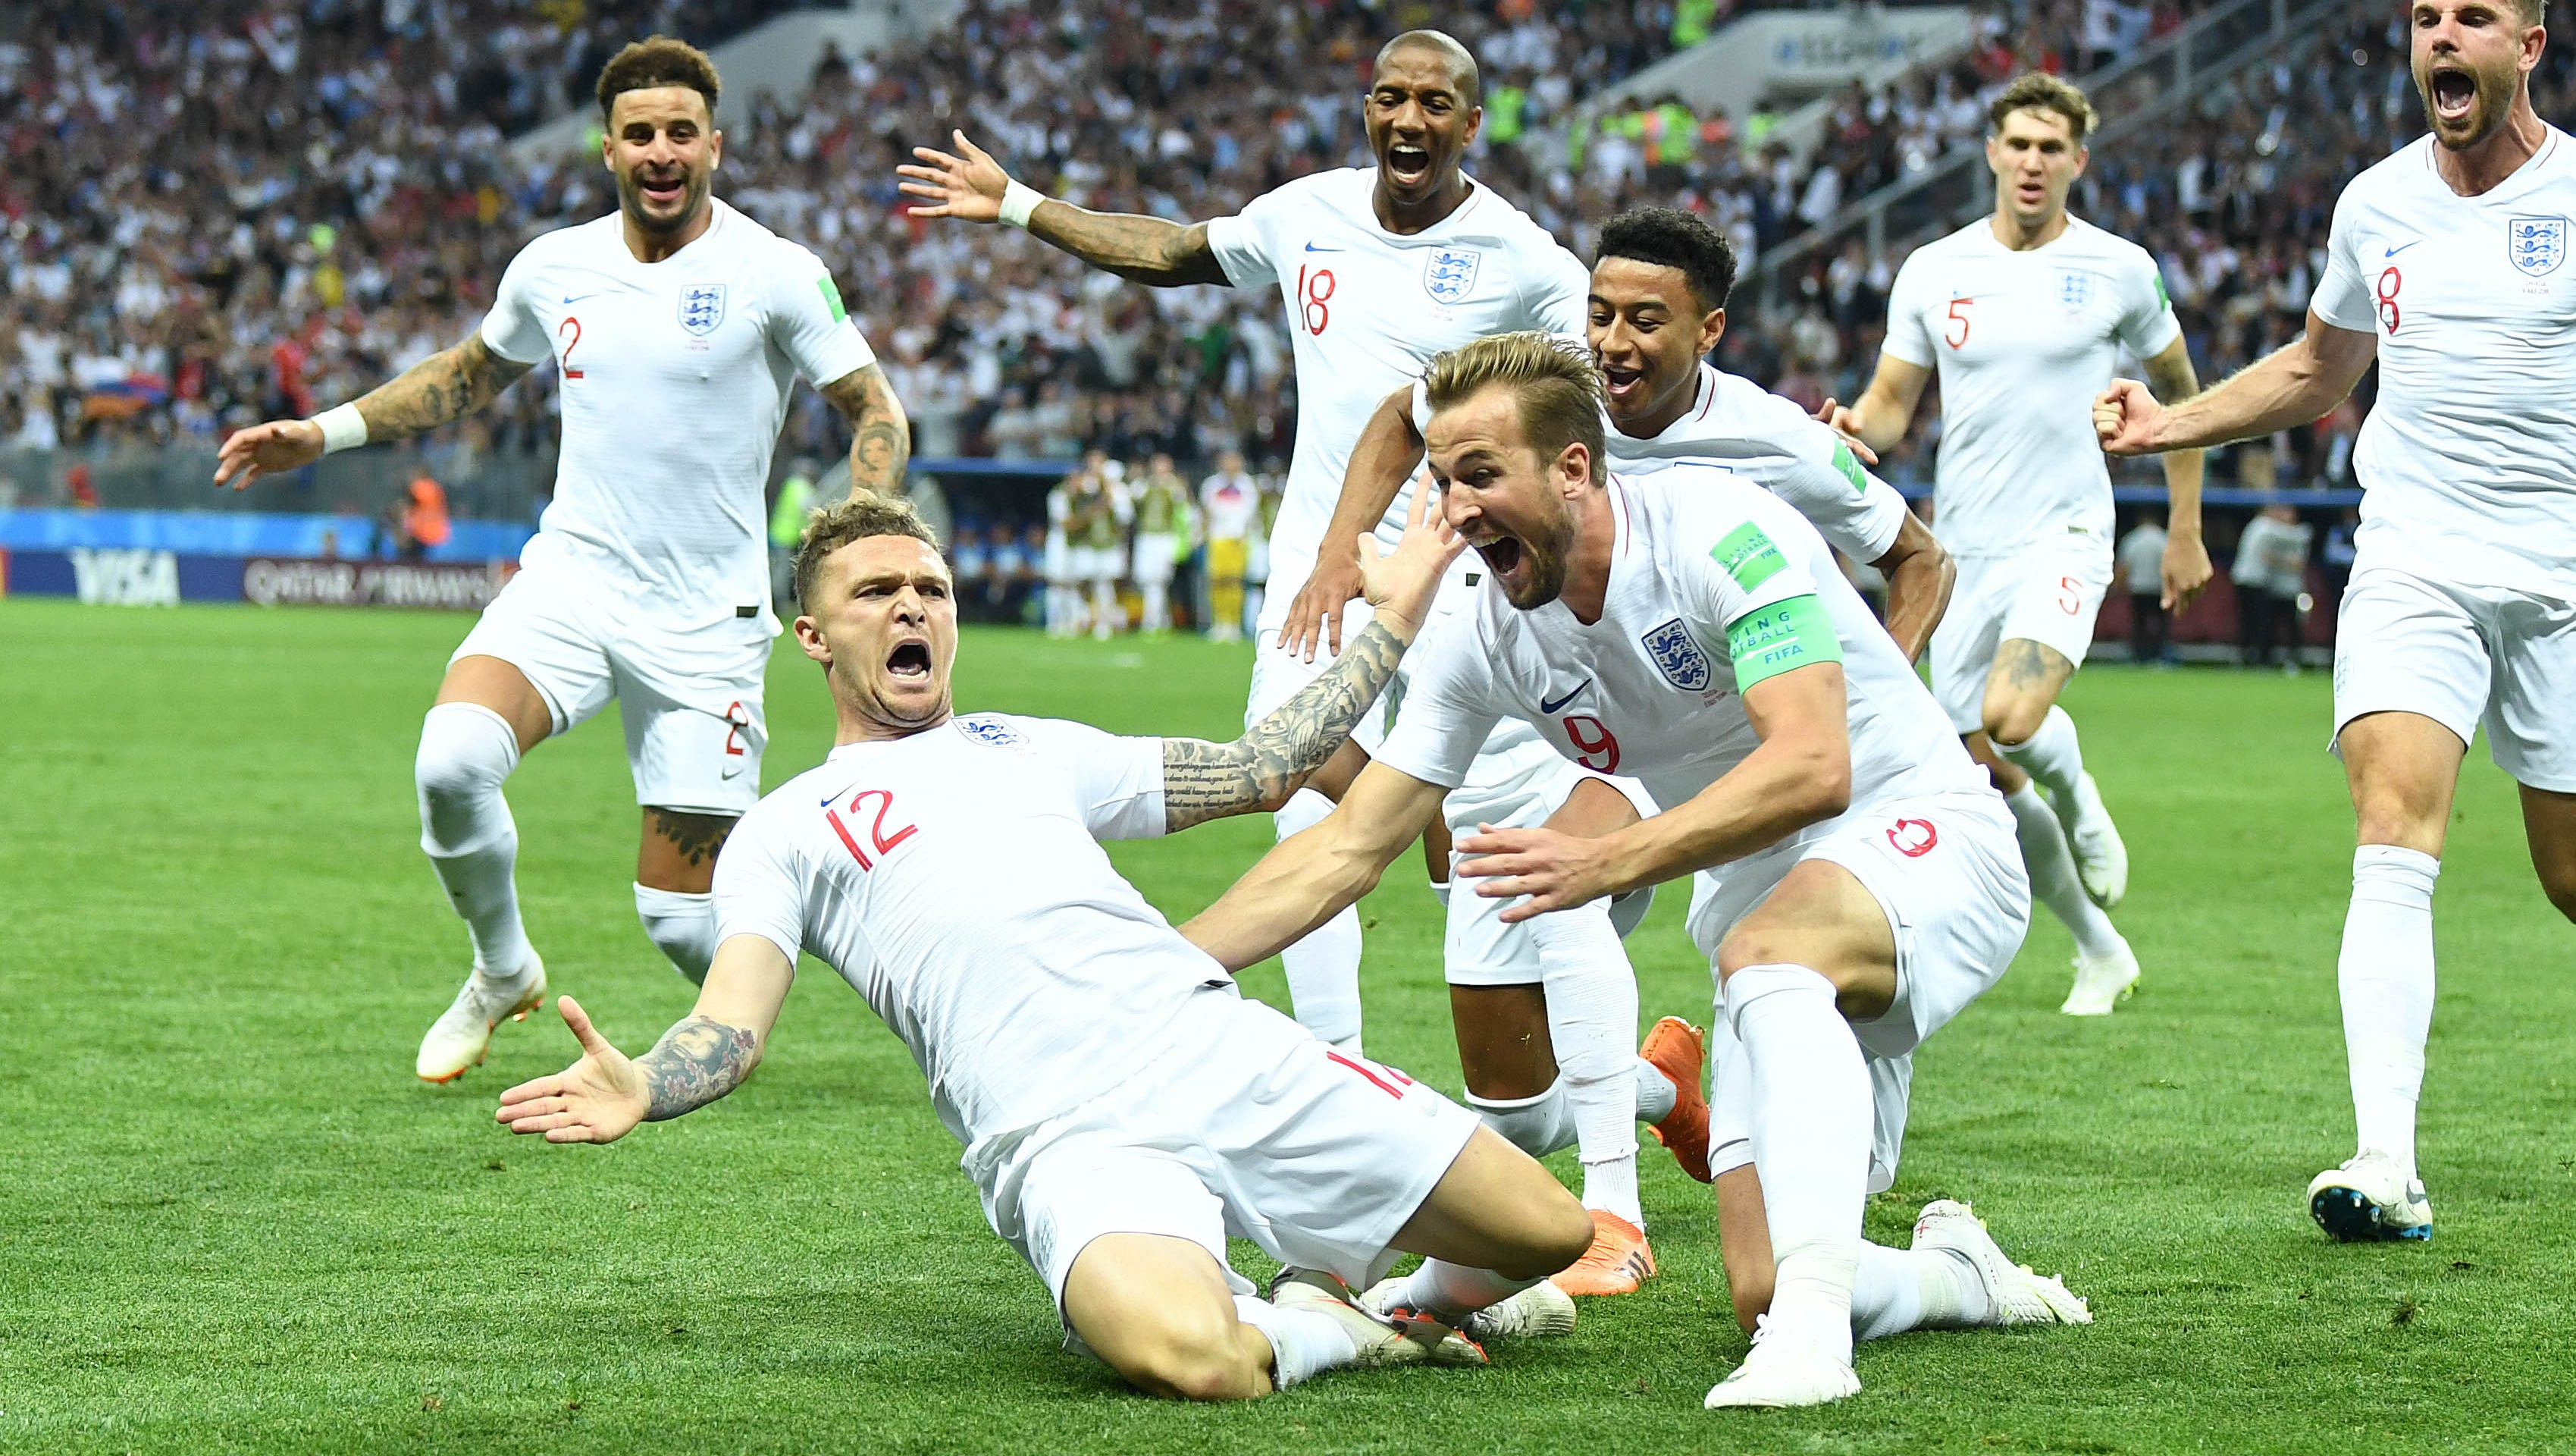 World Cup 2018 Kieran Trippier Free Kick Gives England Early Lead